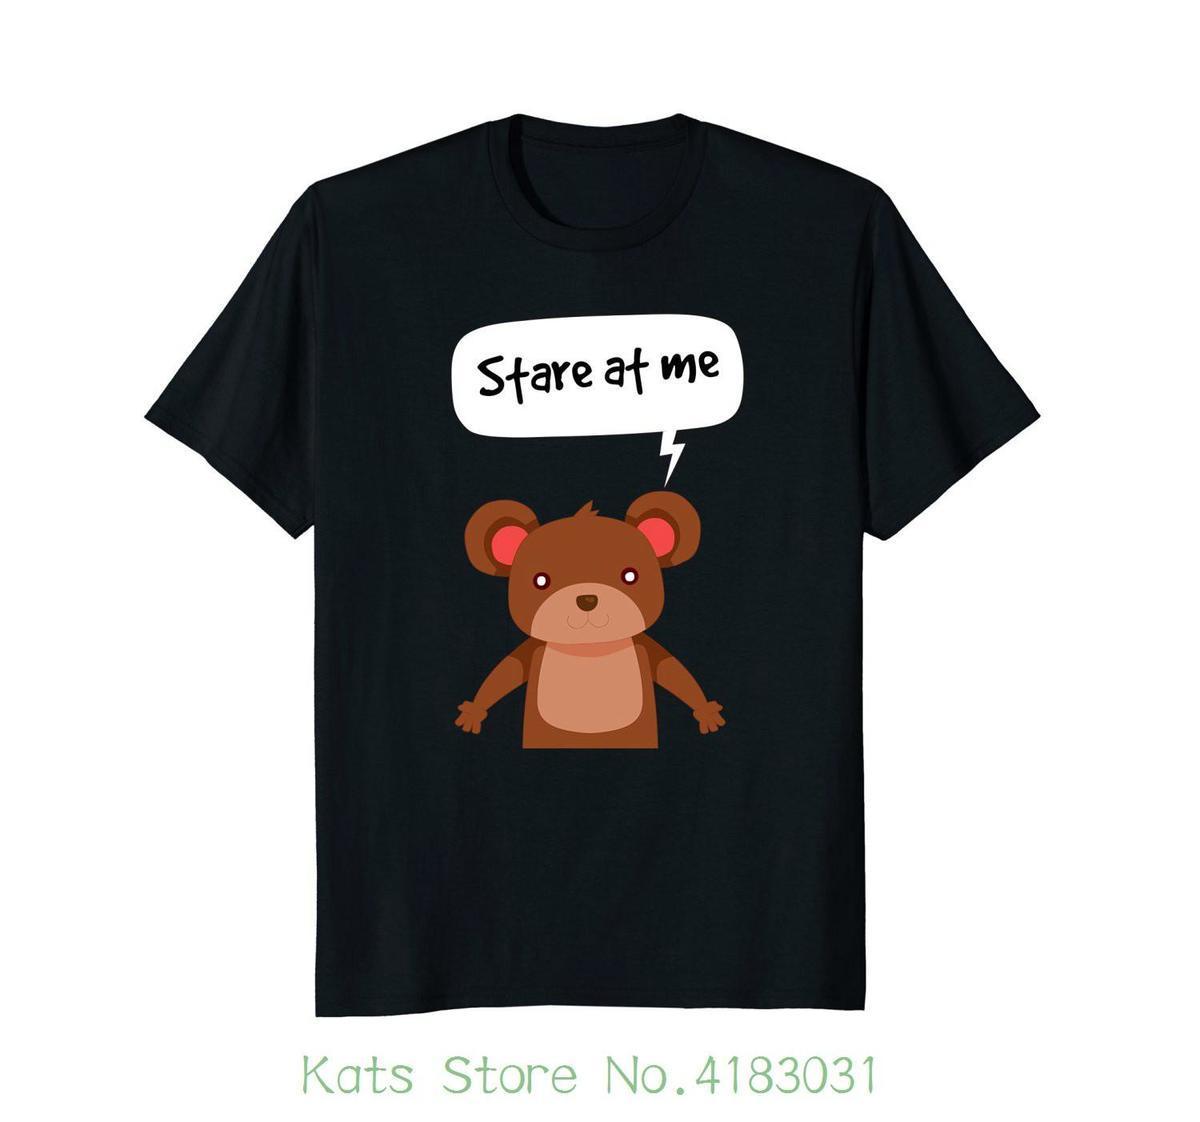 0727589b Funny T Shirts Online Buy - DREAMWORKS